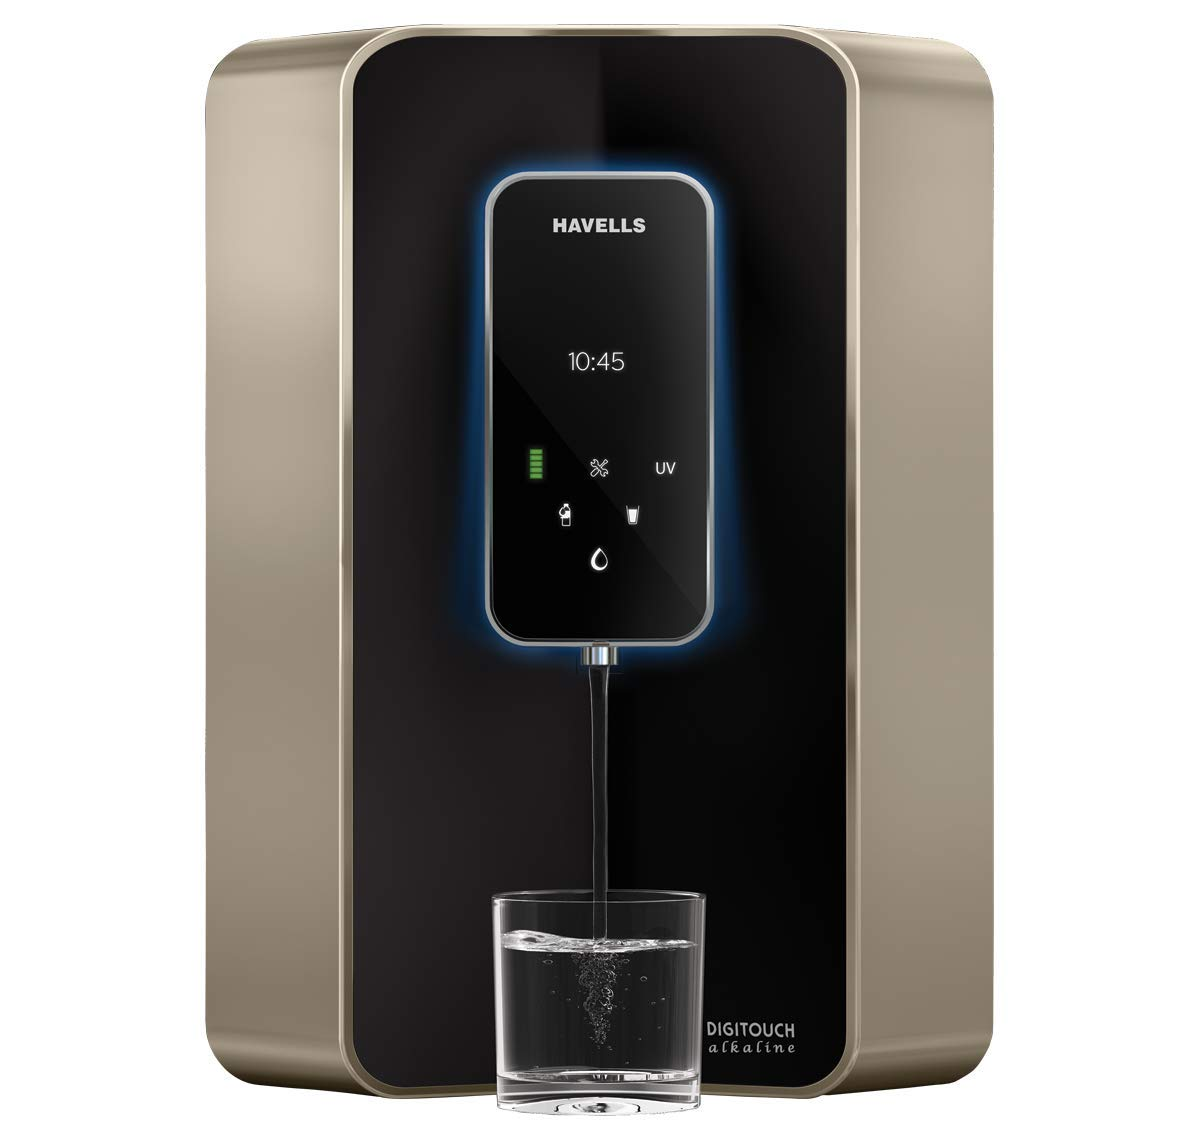 Havells Digitouch Alkaline 100% RO+UV, 6 Litre Water Purifier